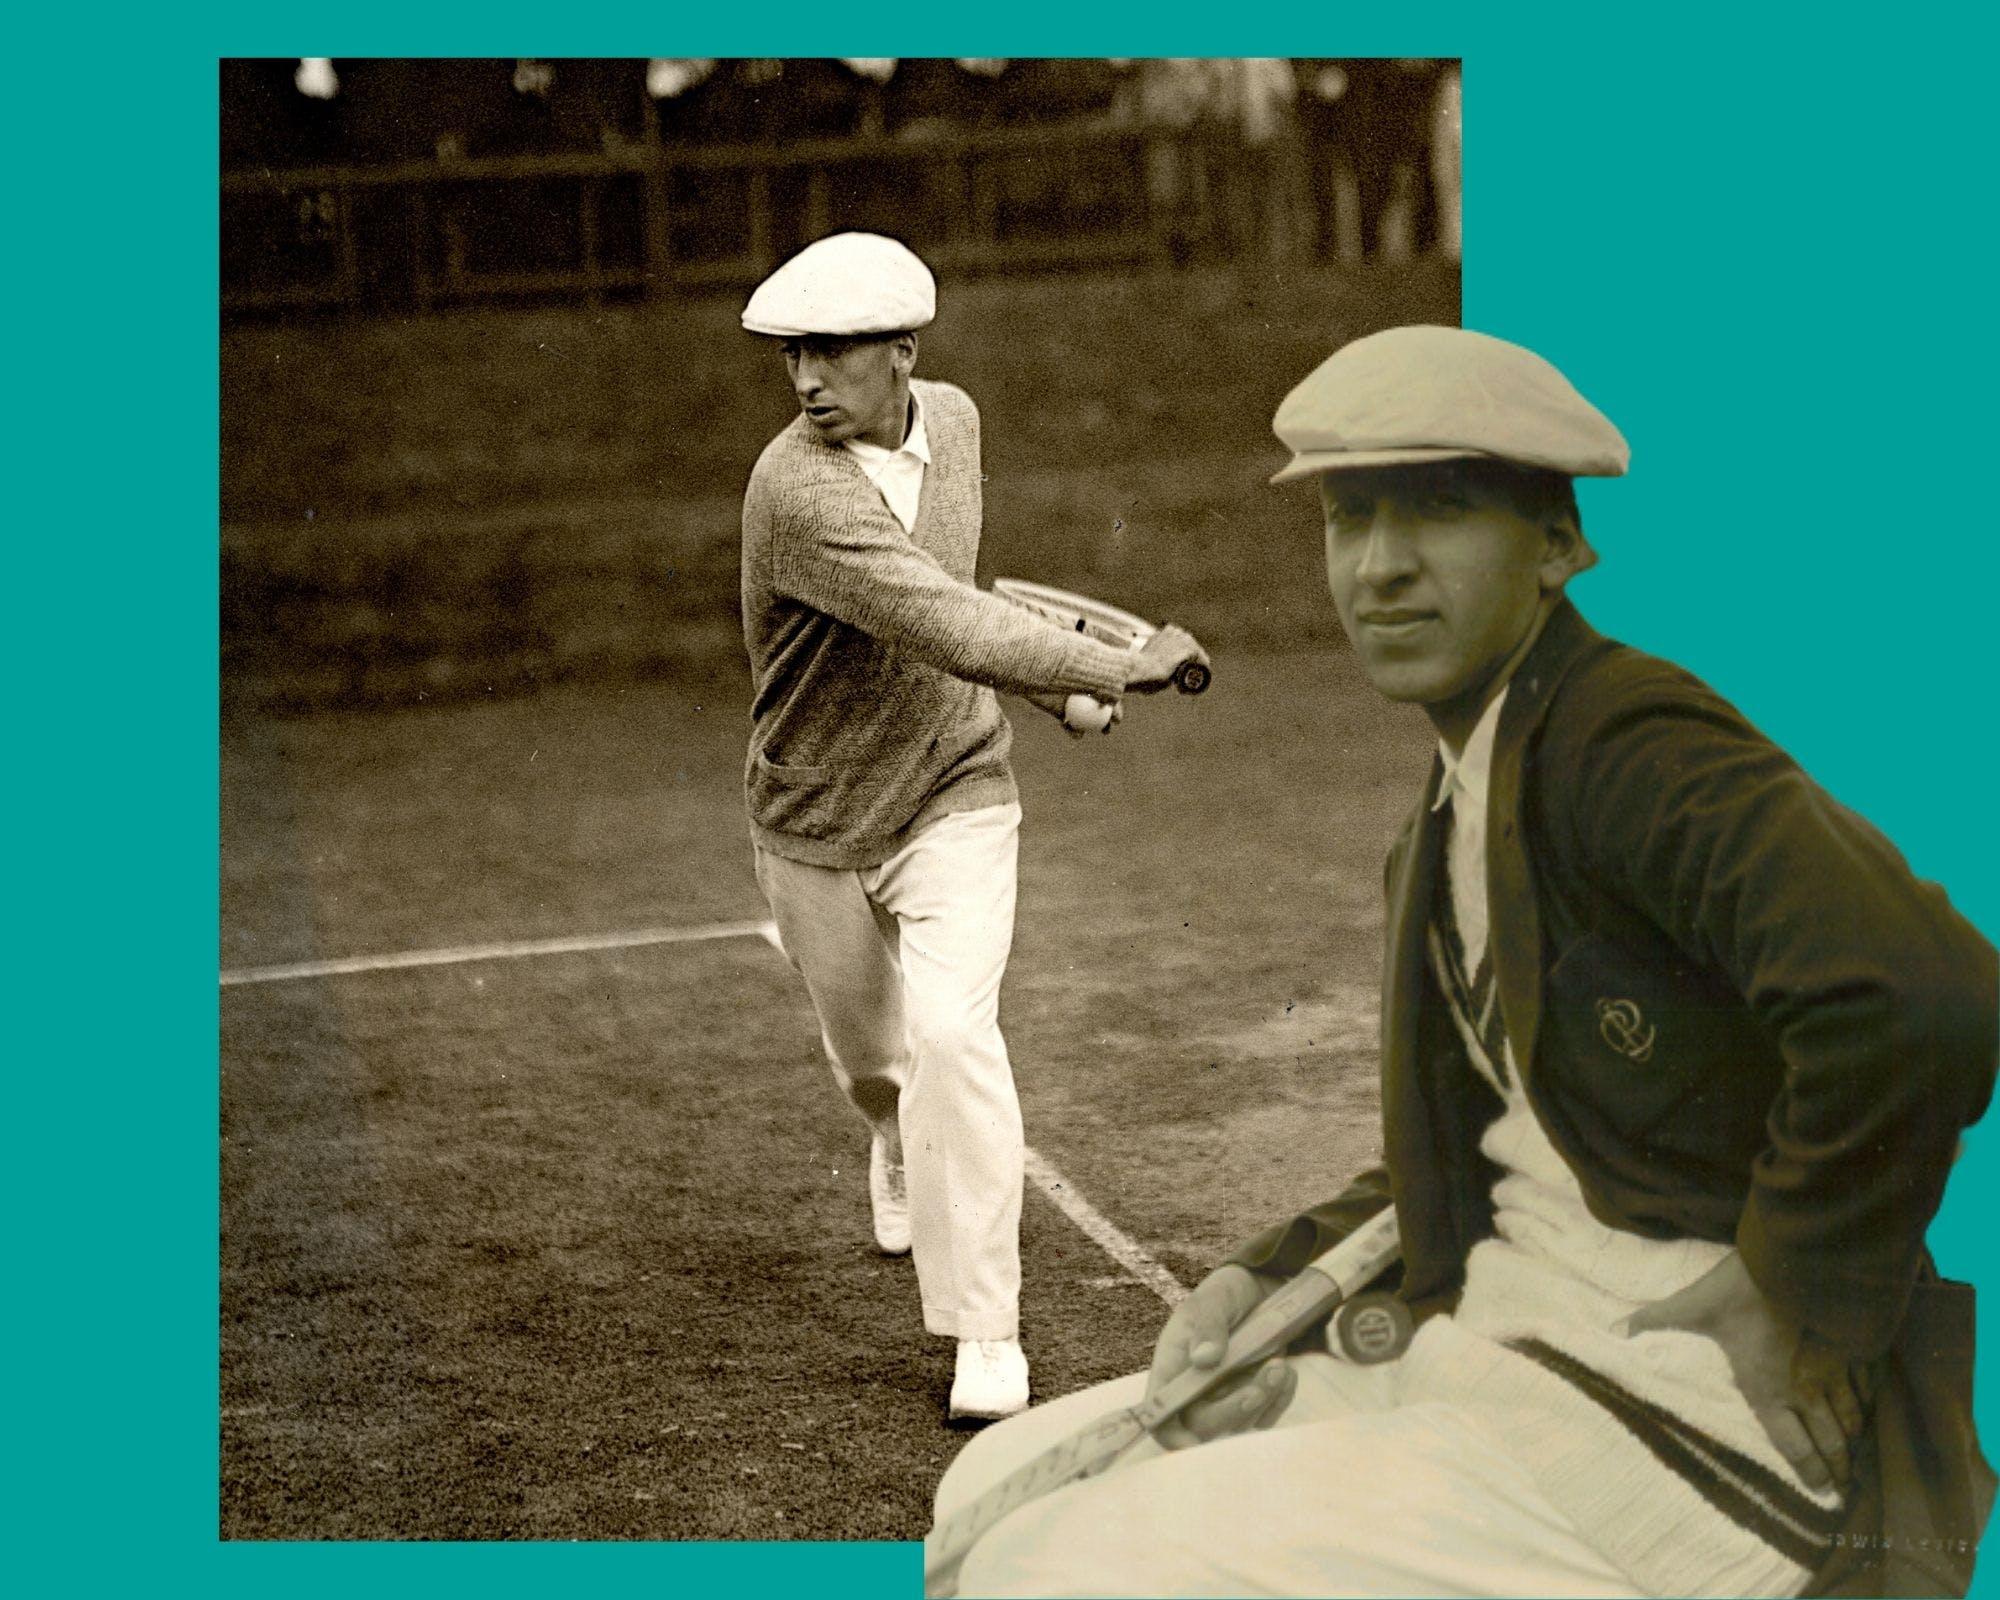 René Lacoste Roland-Garros